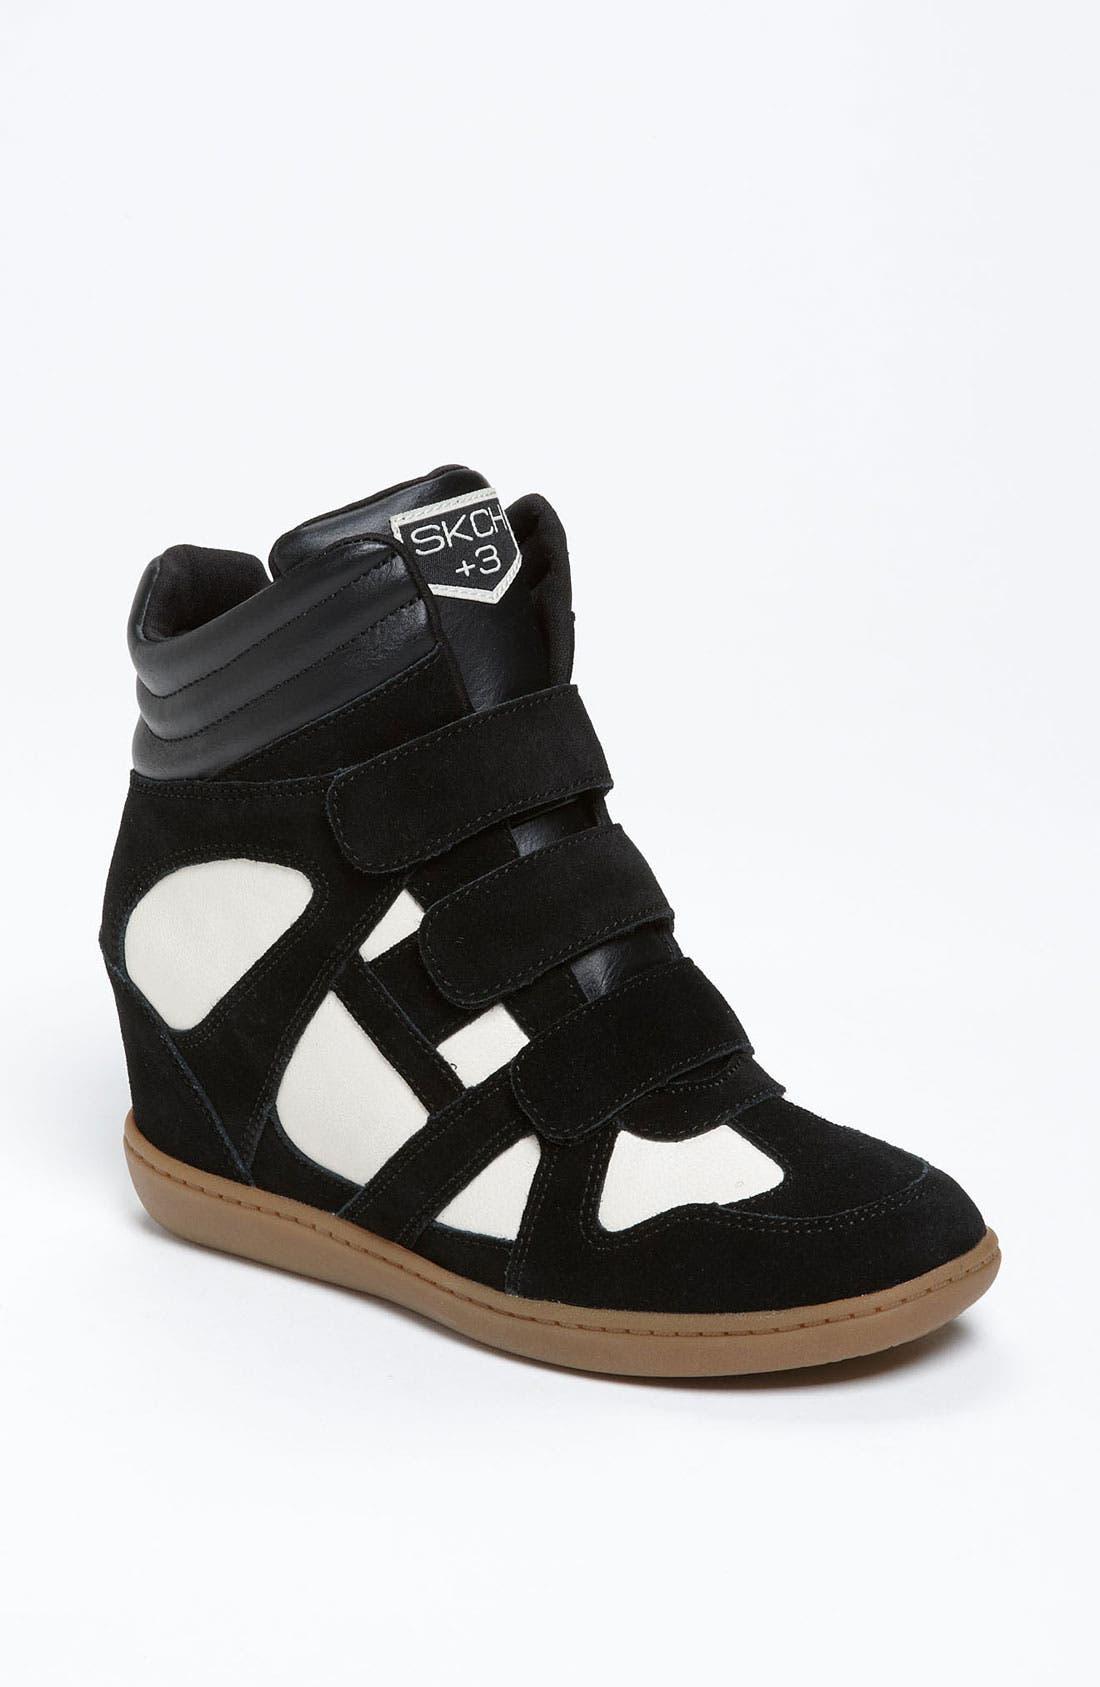 Alternate Image 1 Selected - SKECHERS 'Raise Your Glass' Wedge Sneaker (Women)